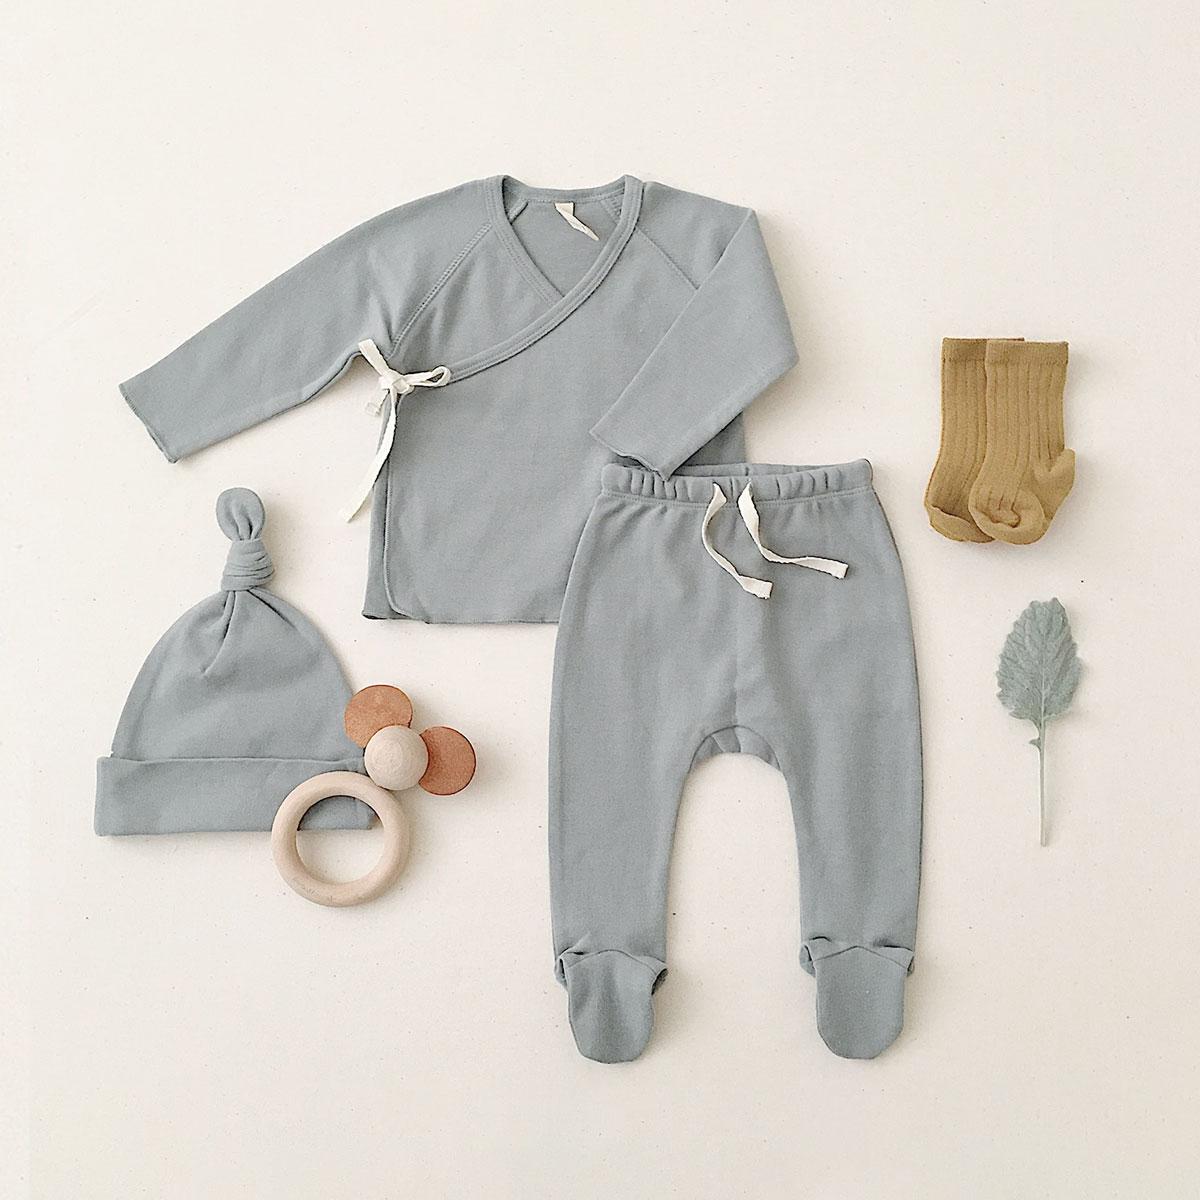 Quincy Mae オーガニックコットン  Kimono Top + Footed Pant SET 6-12M [ネコポス対応可] OCEAN 60 出産祝